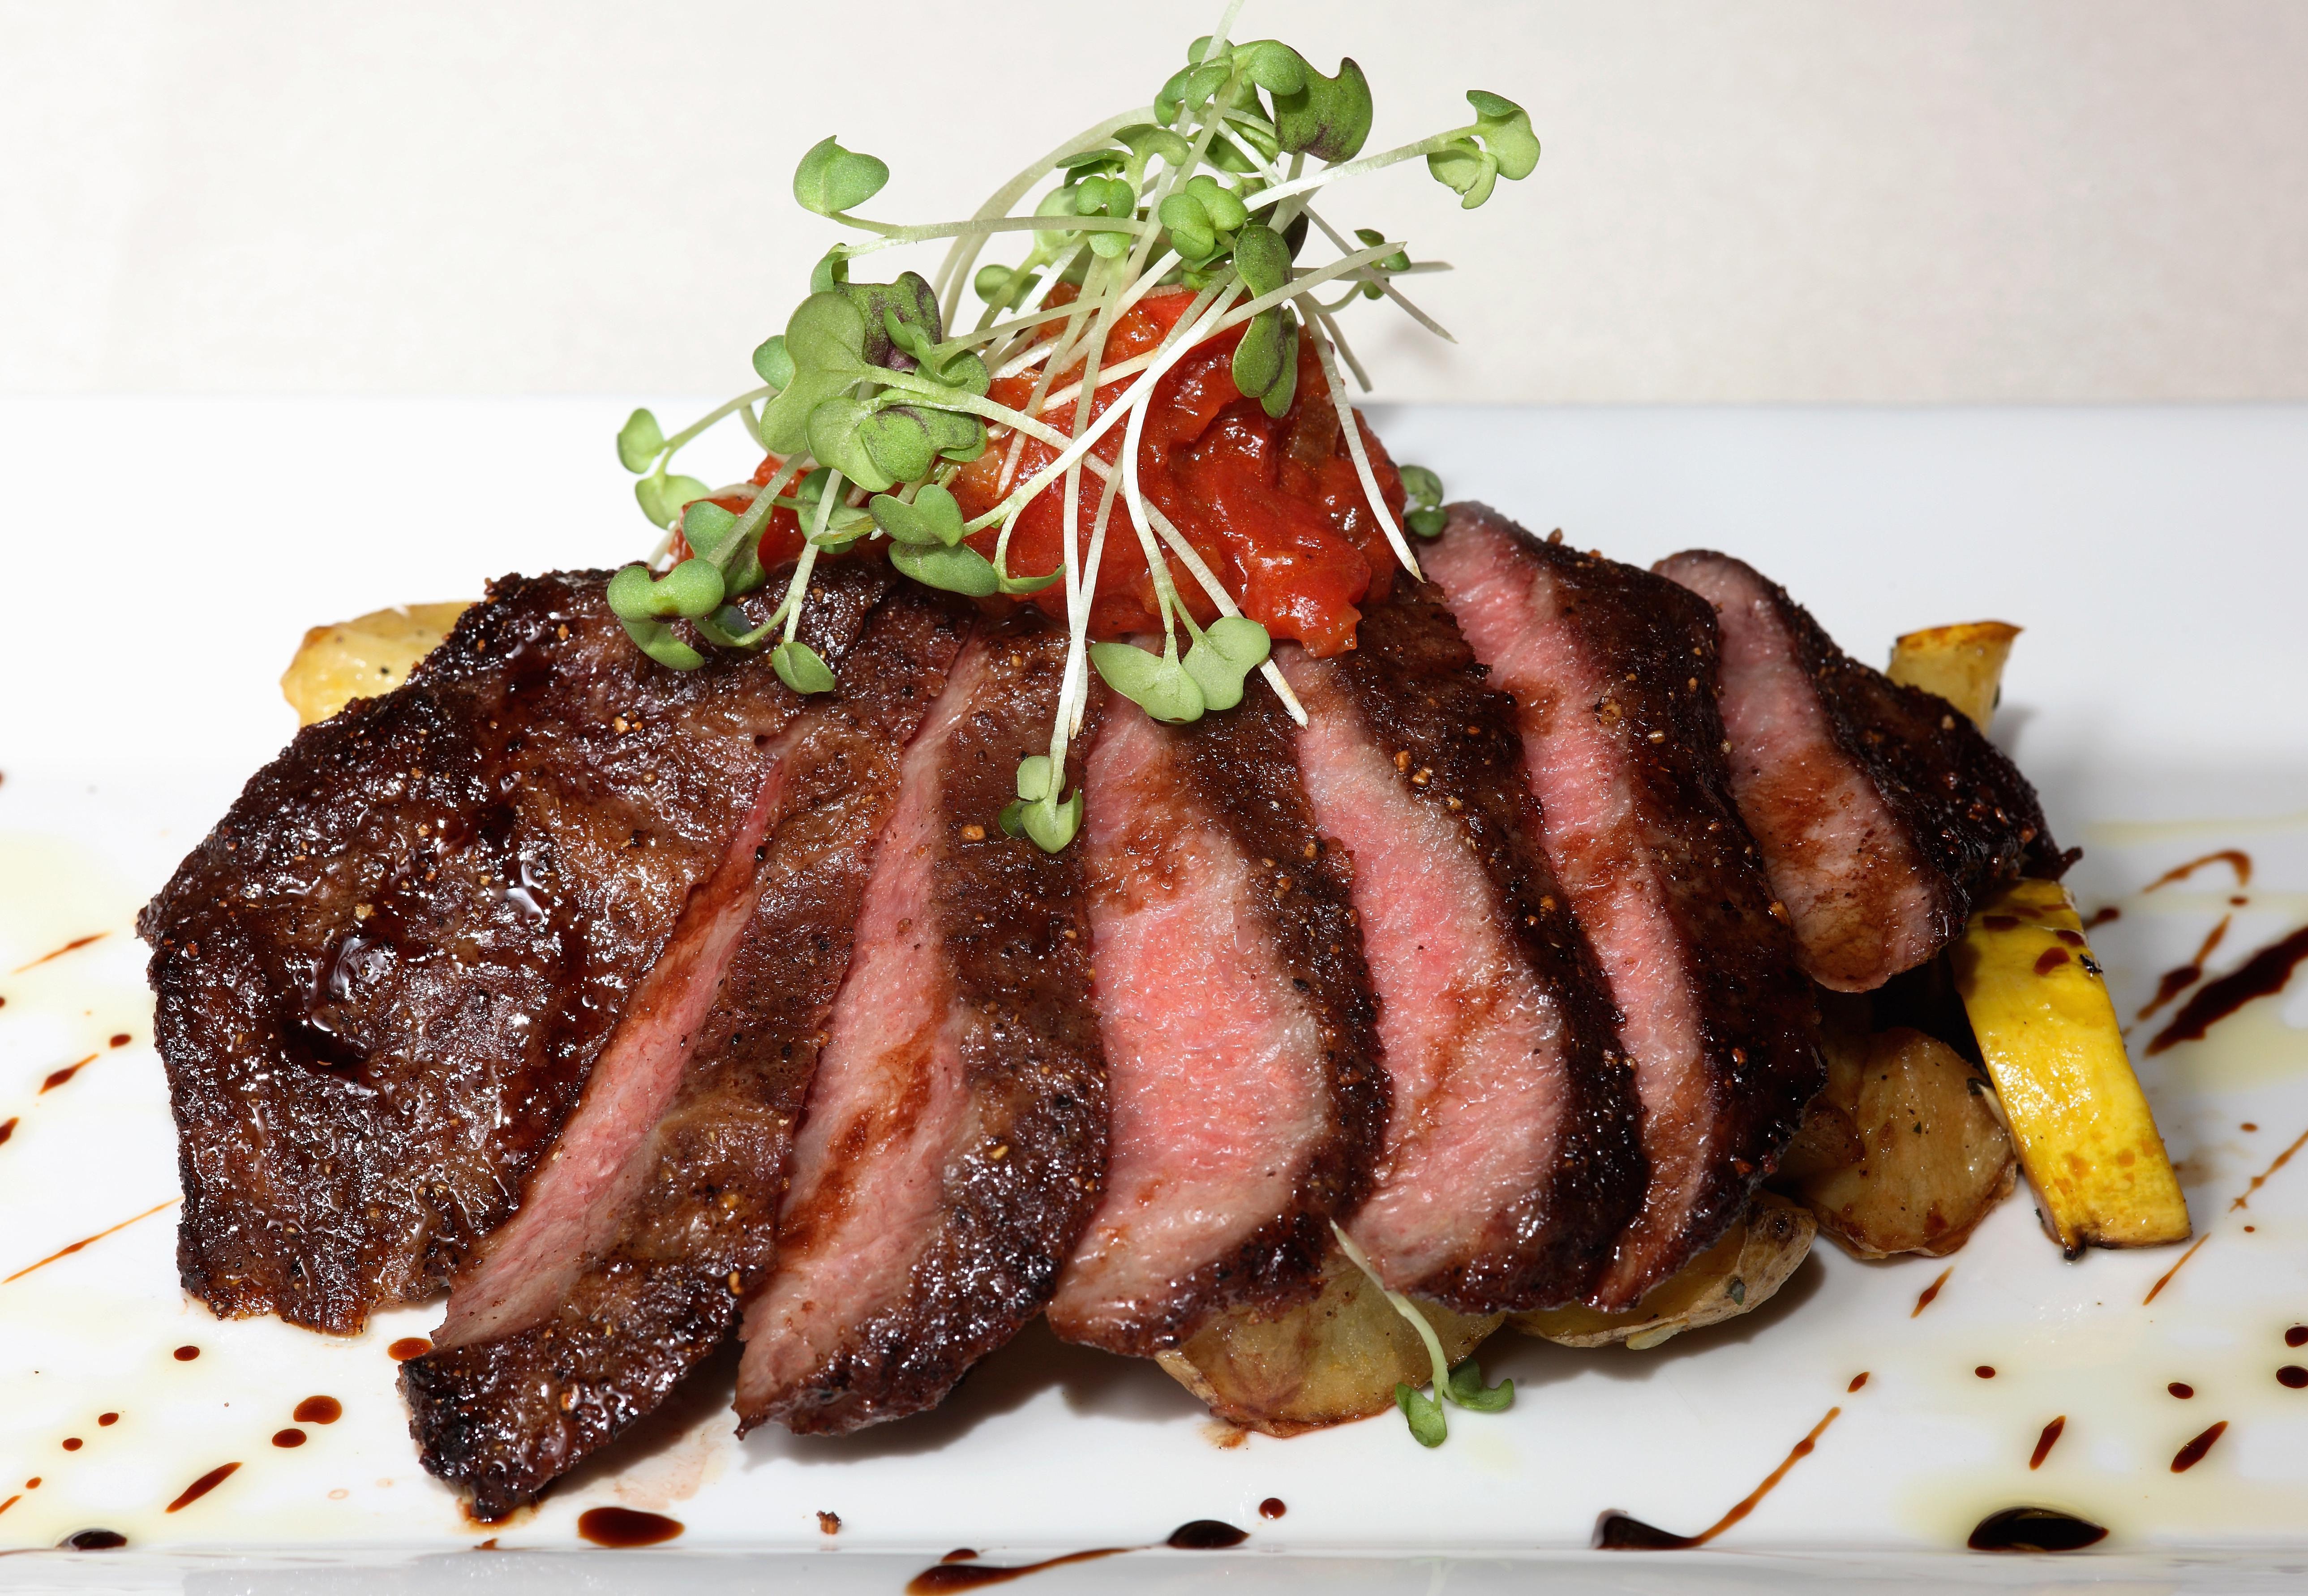 Grilled Flat Iron Steak Recipe